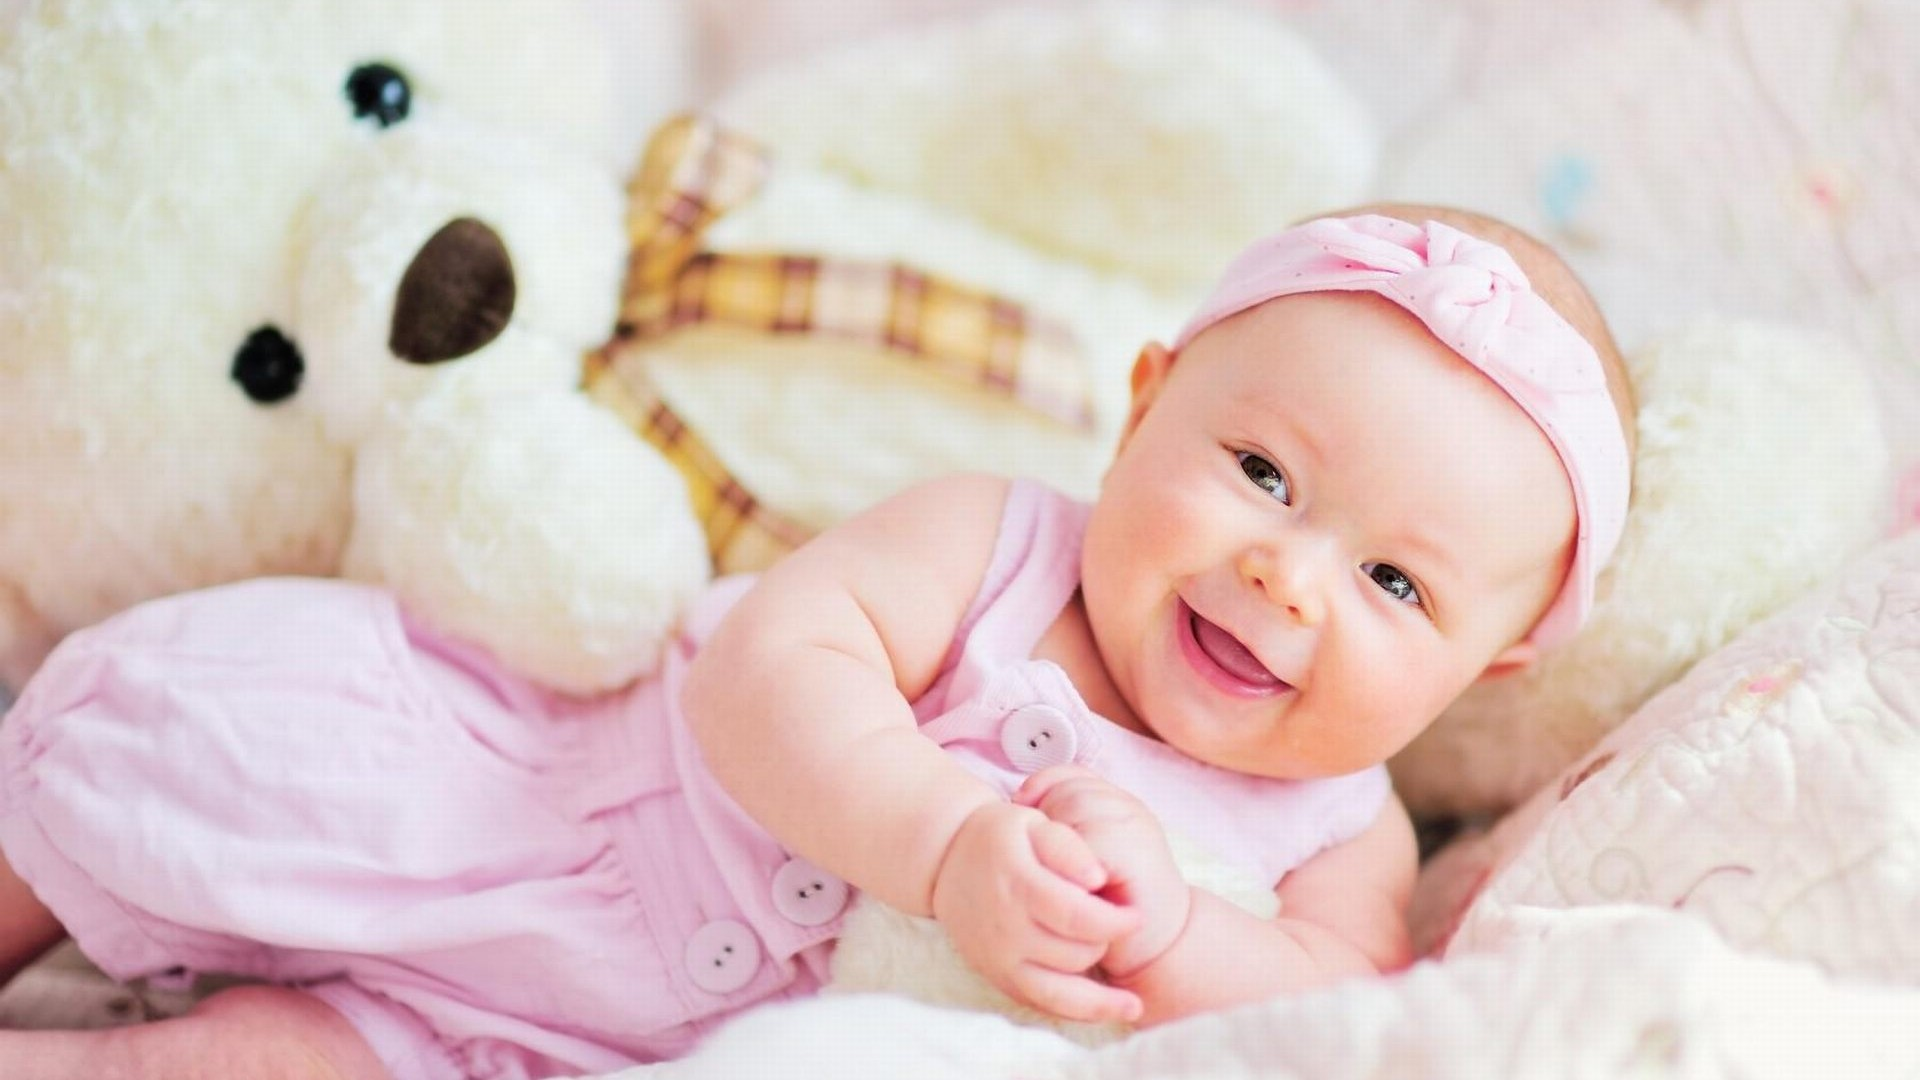 Very Cute And Beautiful Babies Wallpapers In HD 1600×1200 Babies Images  Wallpapers (52 Wallpapers) | Adorable Wallpapers | Desktop | Pinterest |  Baby …